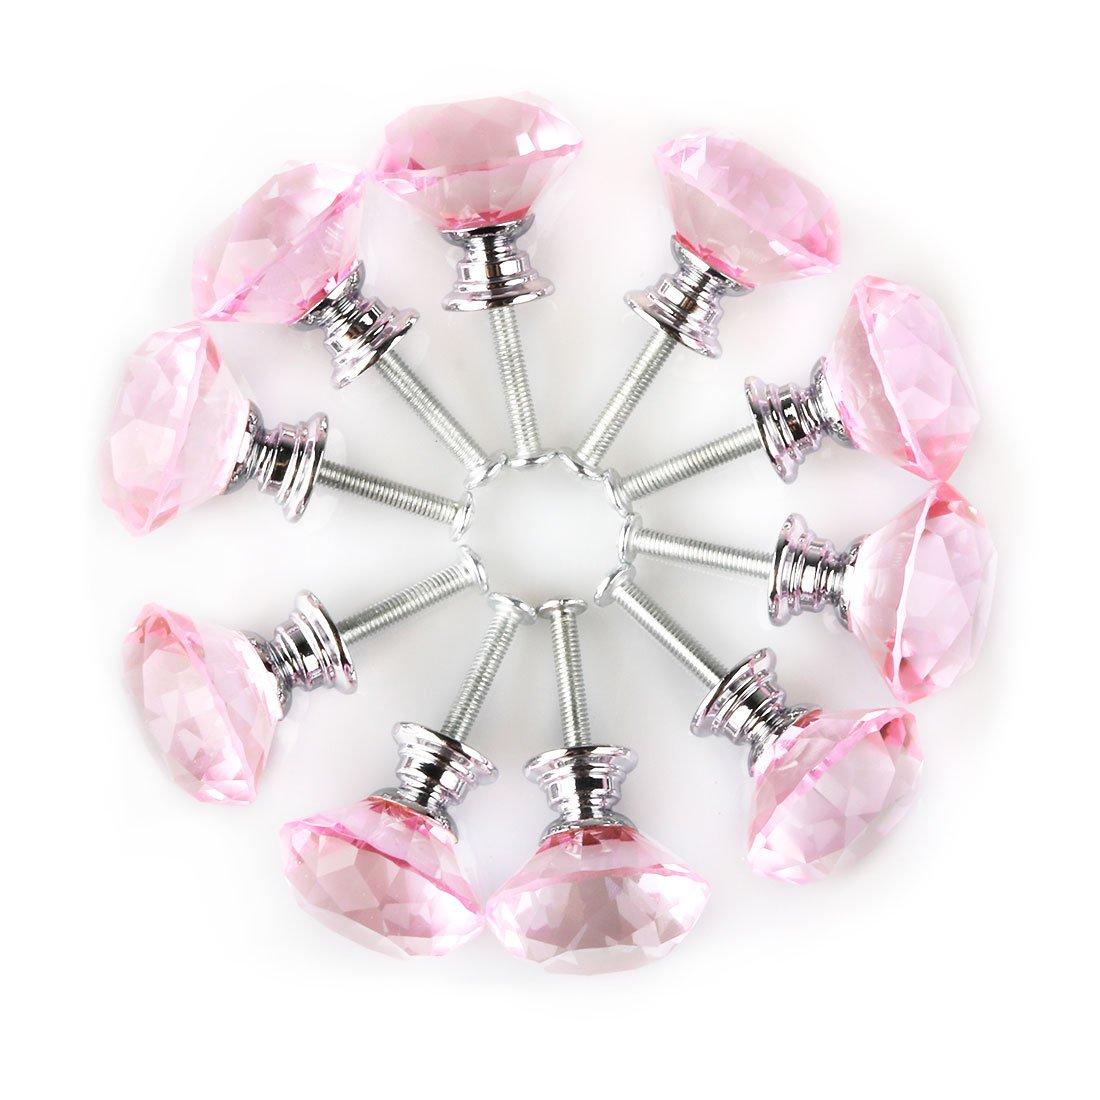 uxcell Diamond Shape Crystal Glass 30mm Kitchen Cabinet Door Drawer Knob Cupboard Dresser Wardrobe Pull Handle with Screws, 10pcs Pink